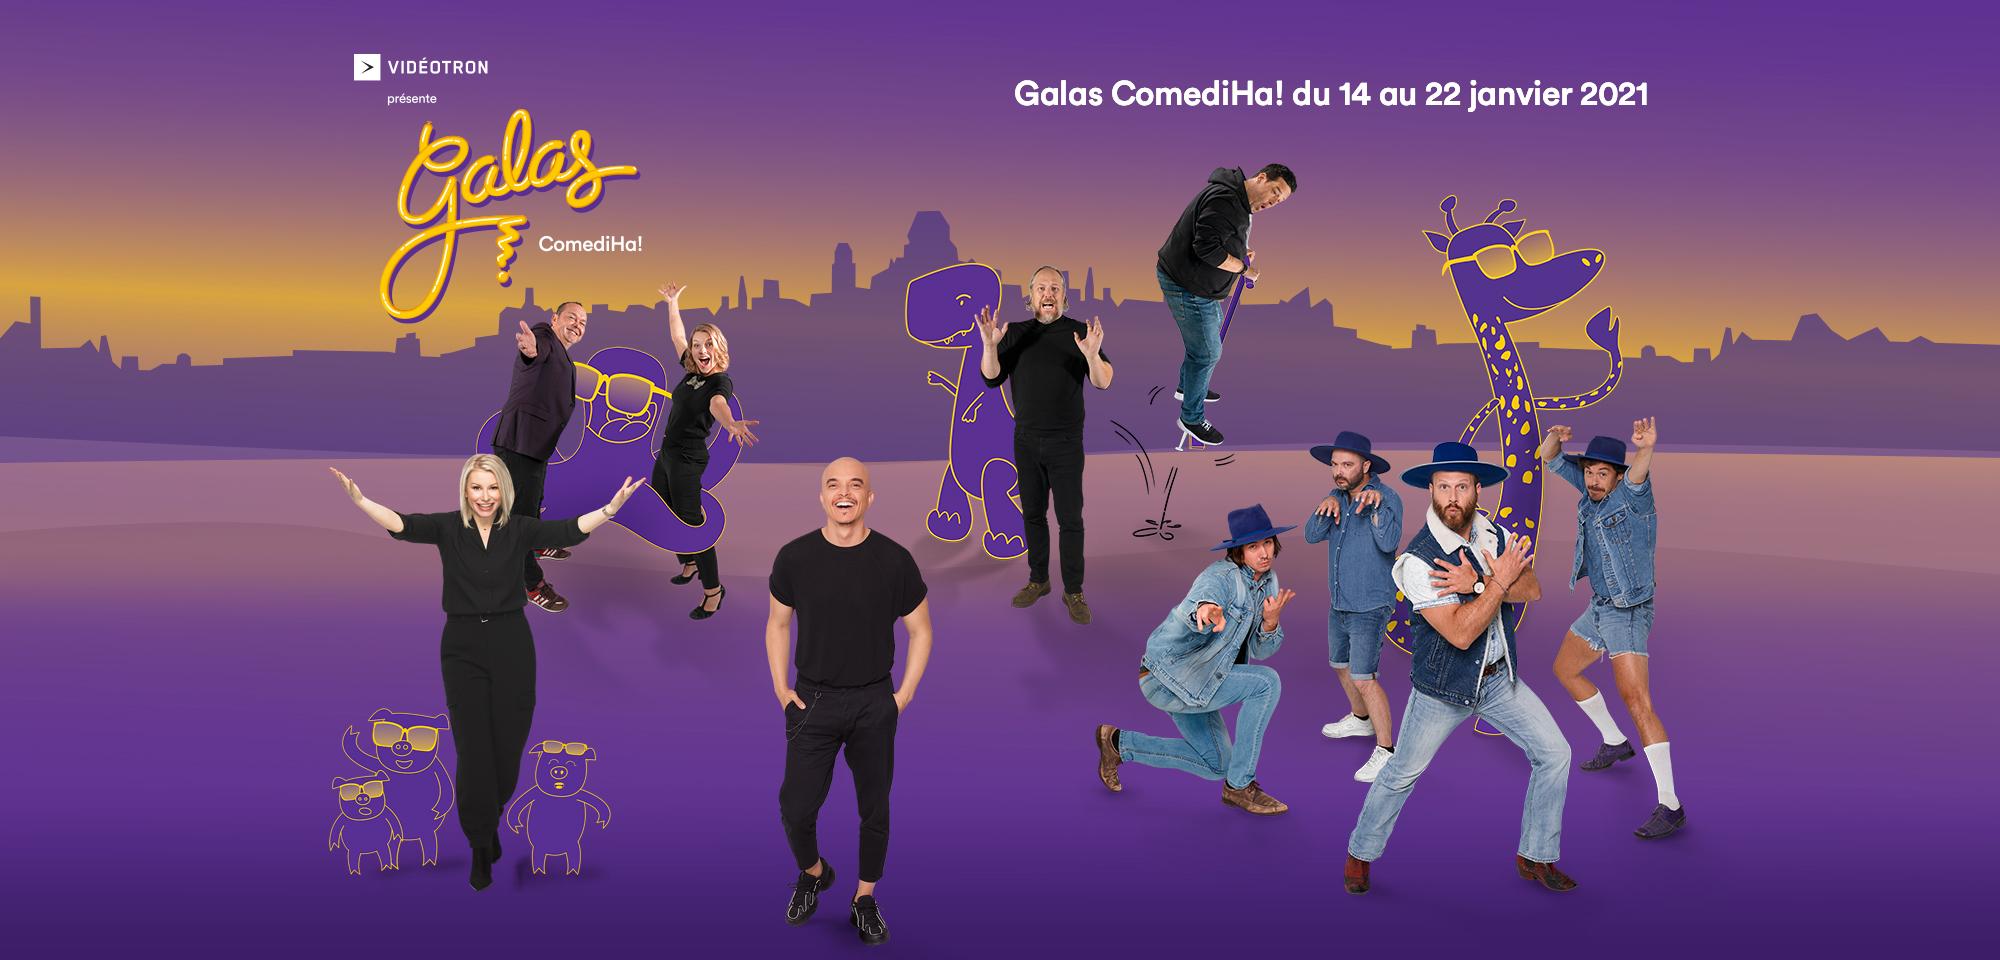 Galas ComediHa!